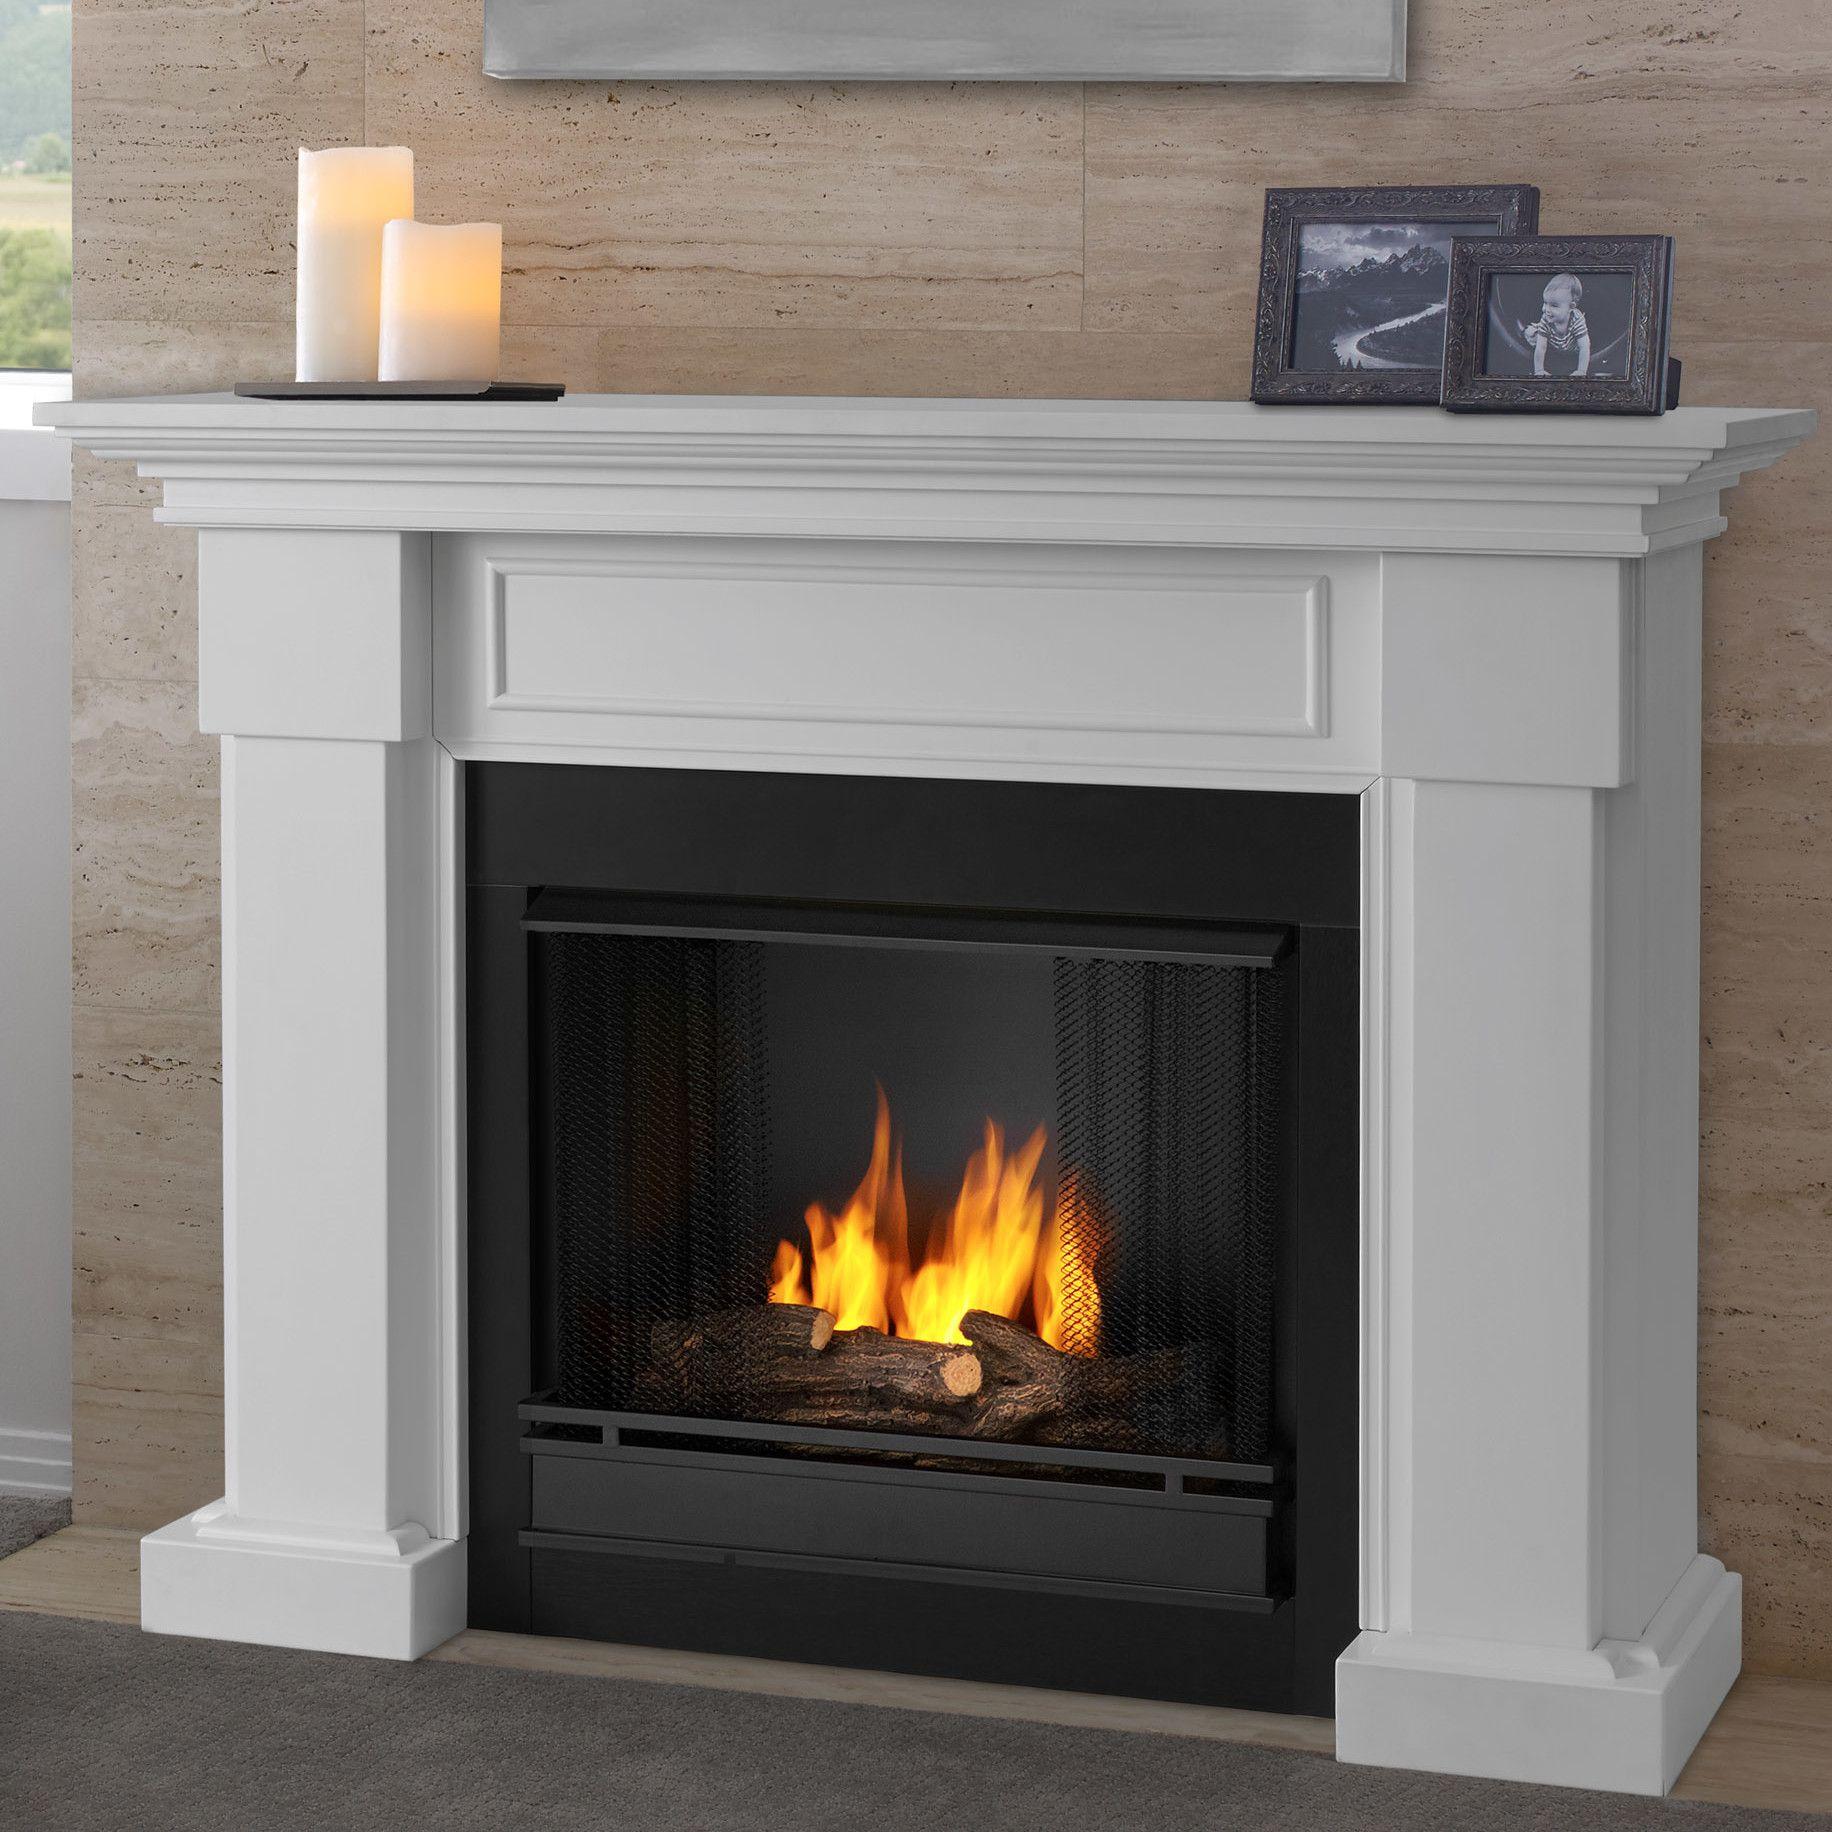 hillcrest gel fuel fireplace mediterranean style verandas and